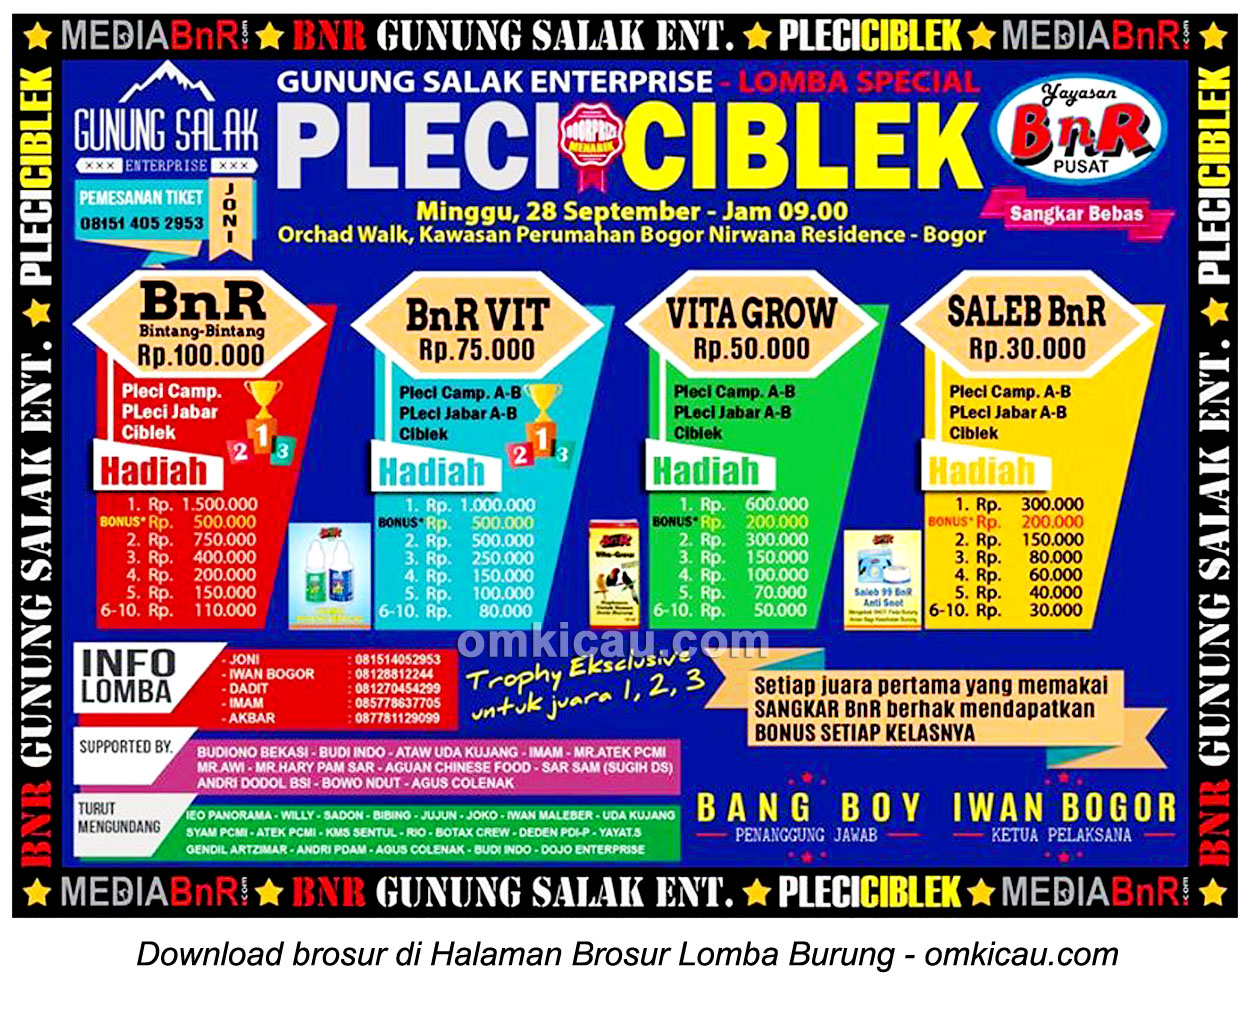 Brosur Lomba Special Pleci & Ciblek, Bogor, 28 September 2014